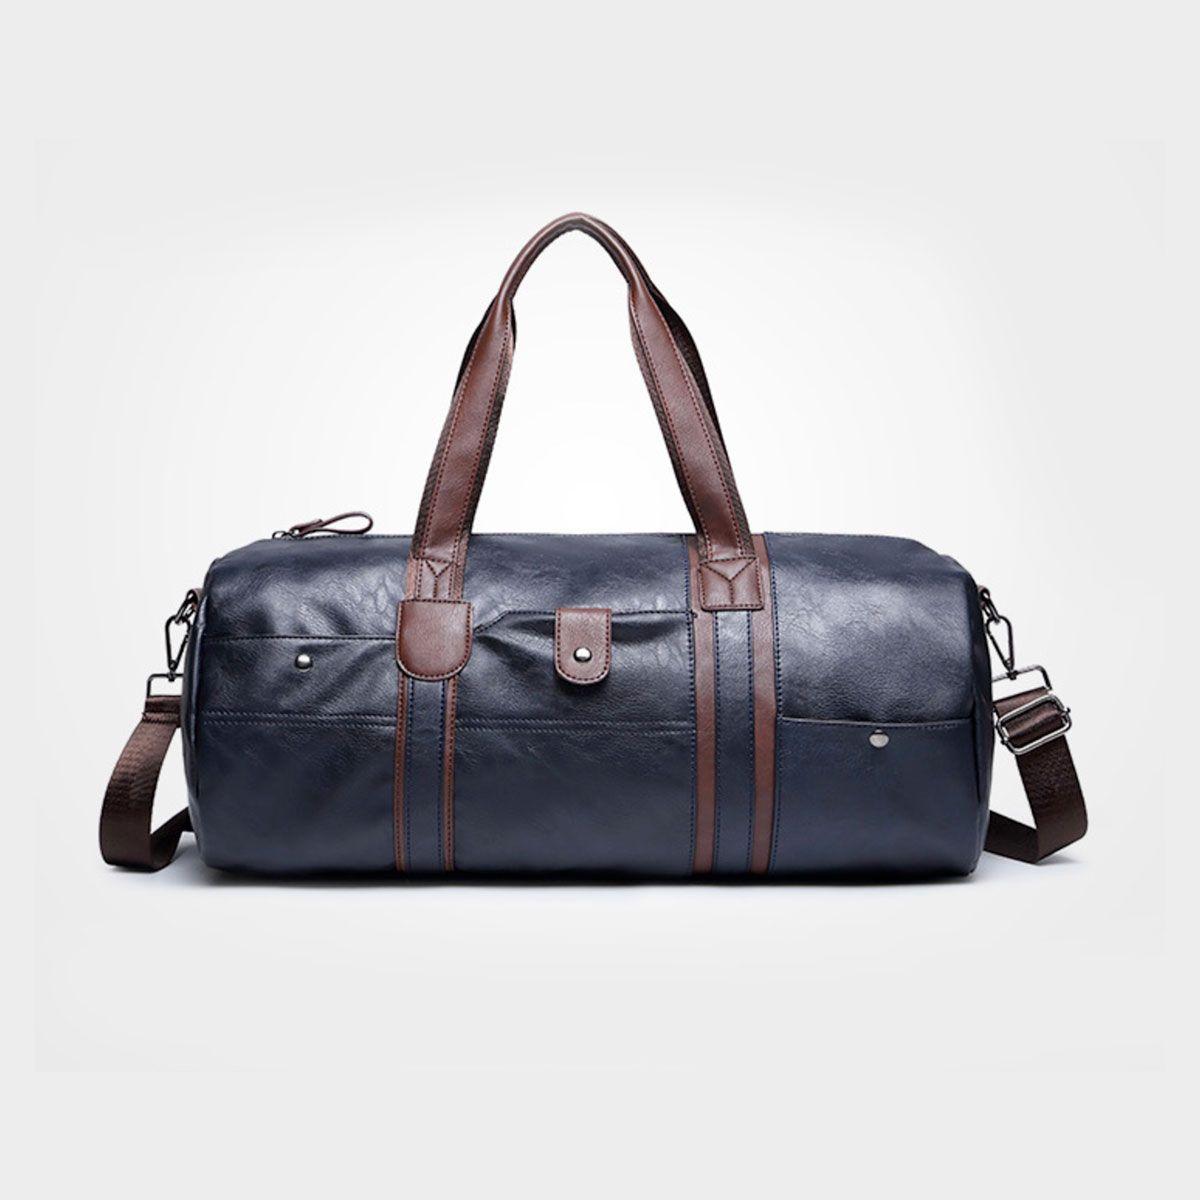 2016 NEW Men leather travel duffle bag sac de voyage Cossbody Small Business  handbags bolsa de couro masculina 07cb31f5eb